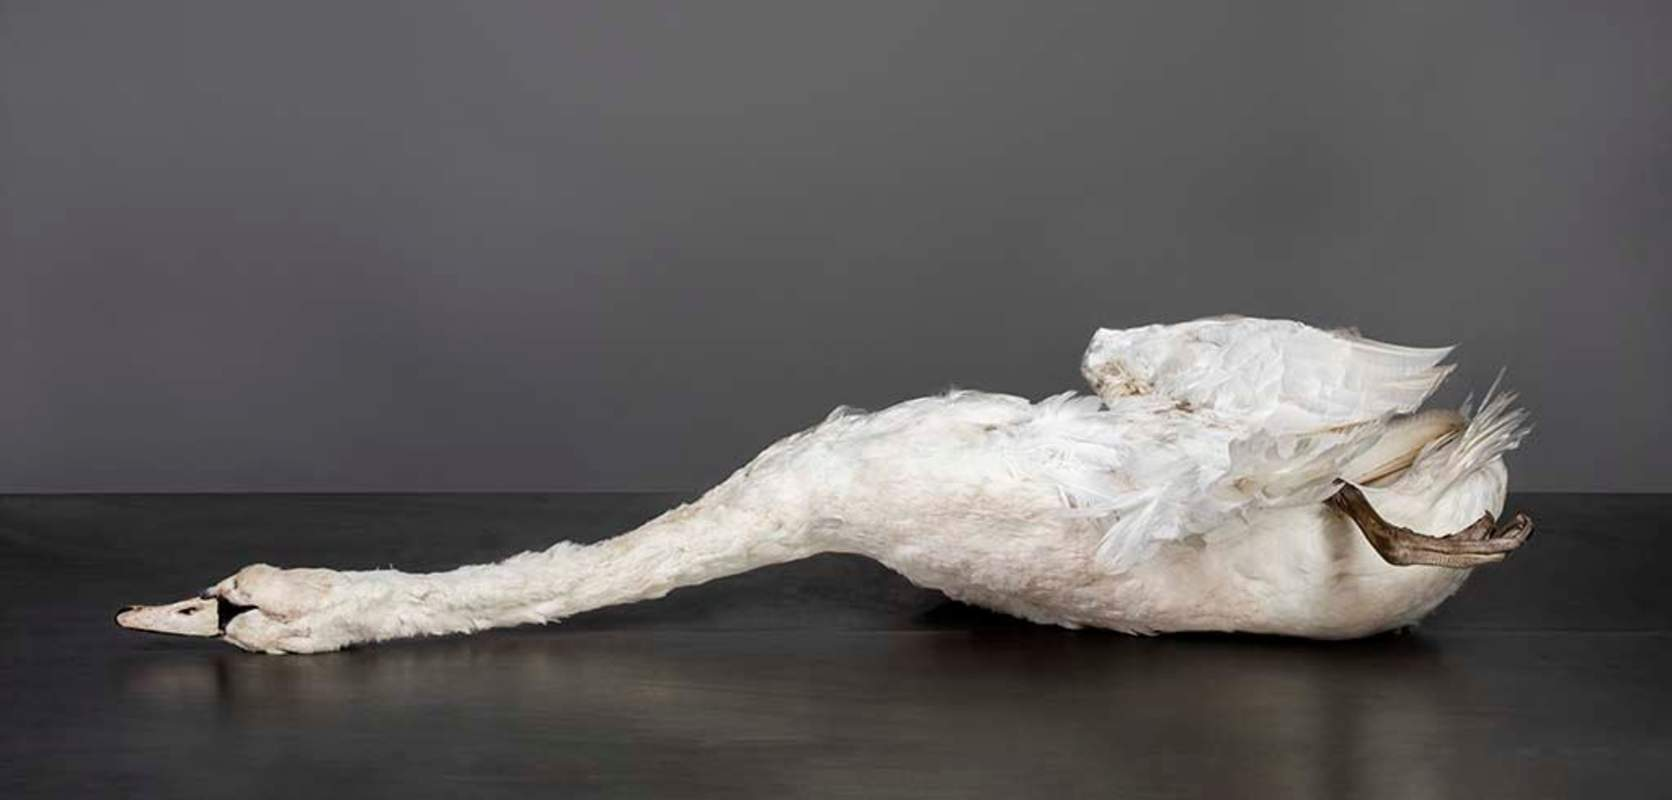 Zwaan Karin Borghouts70x140cm